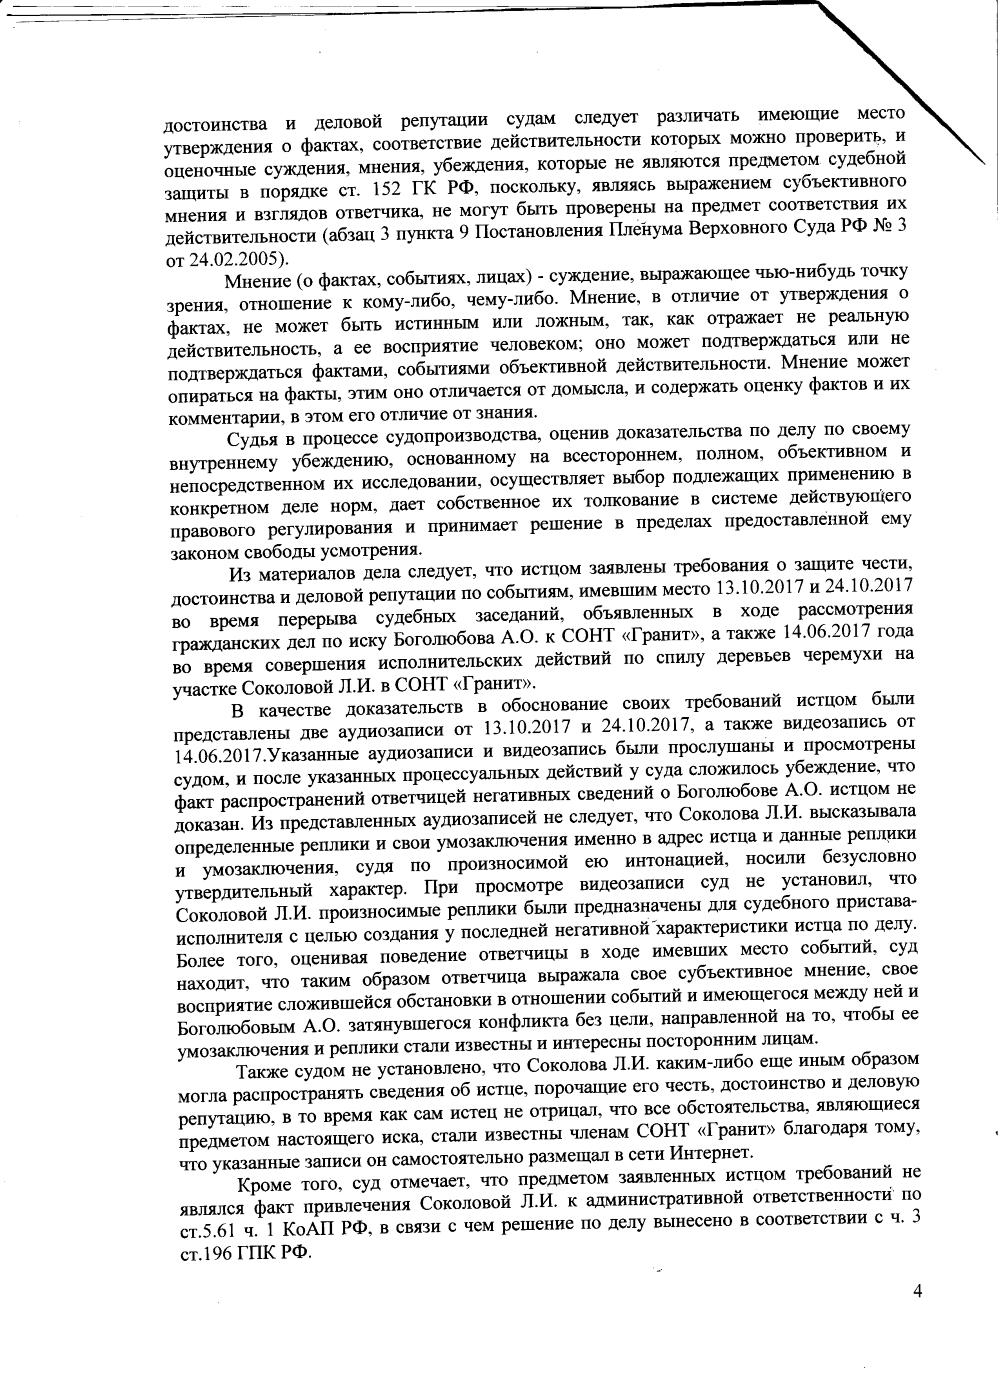 https://sontgranit.ru/forum/img/sokol/20180209-решение-5.png